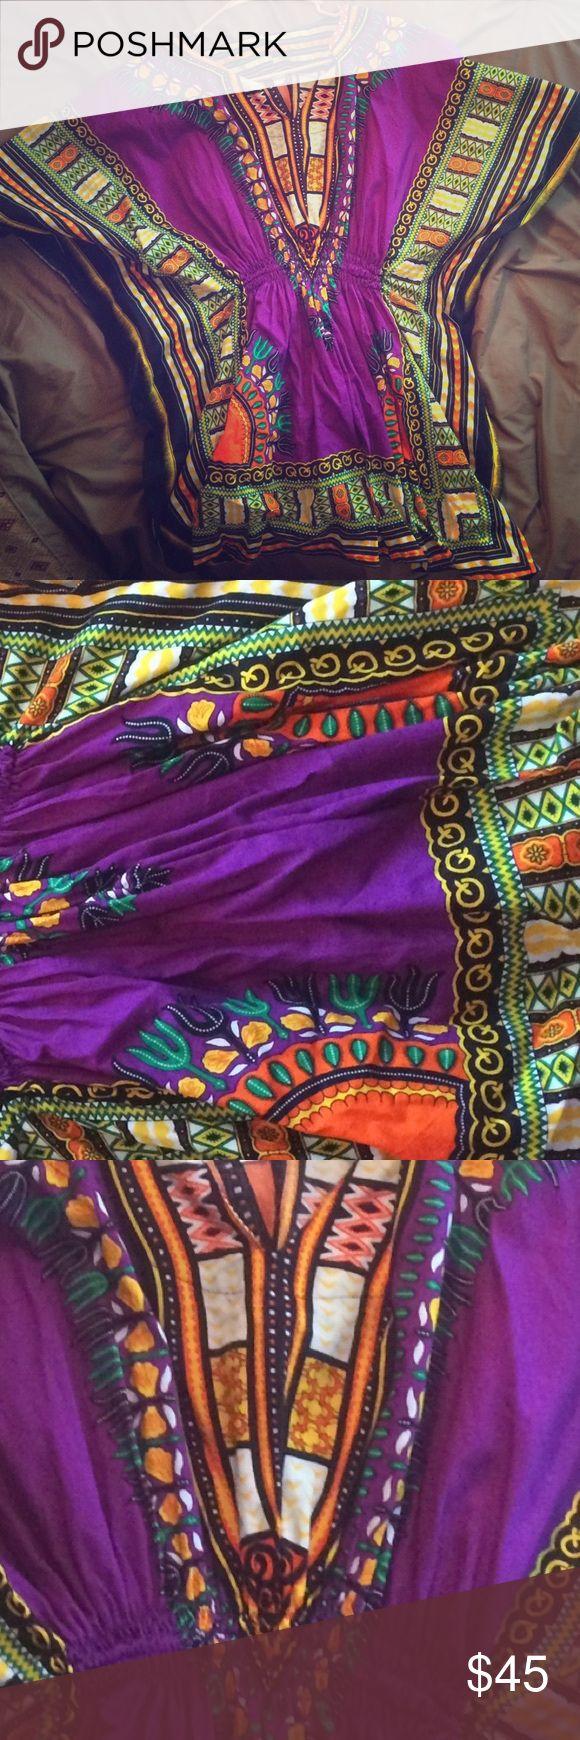 Authentic African Dashiki This a 100% original authentic African Dashiki. Brand new! african dashiki Dresses